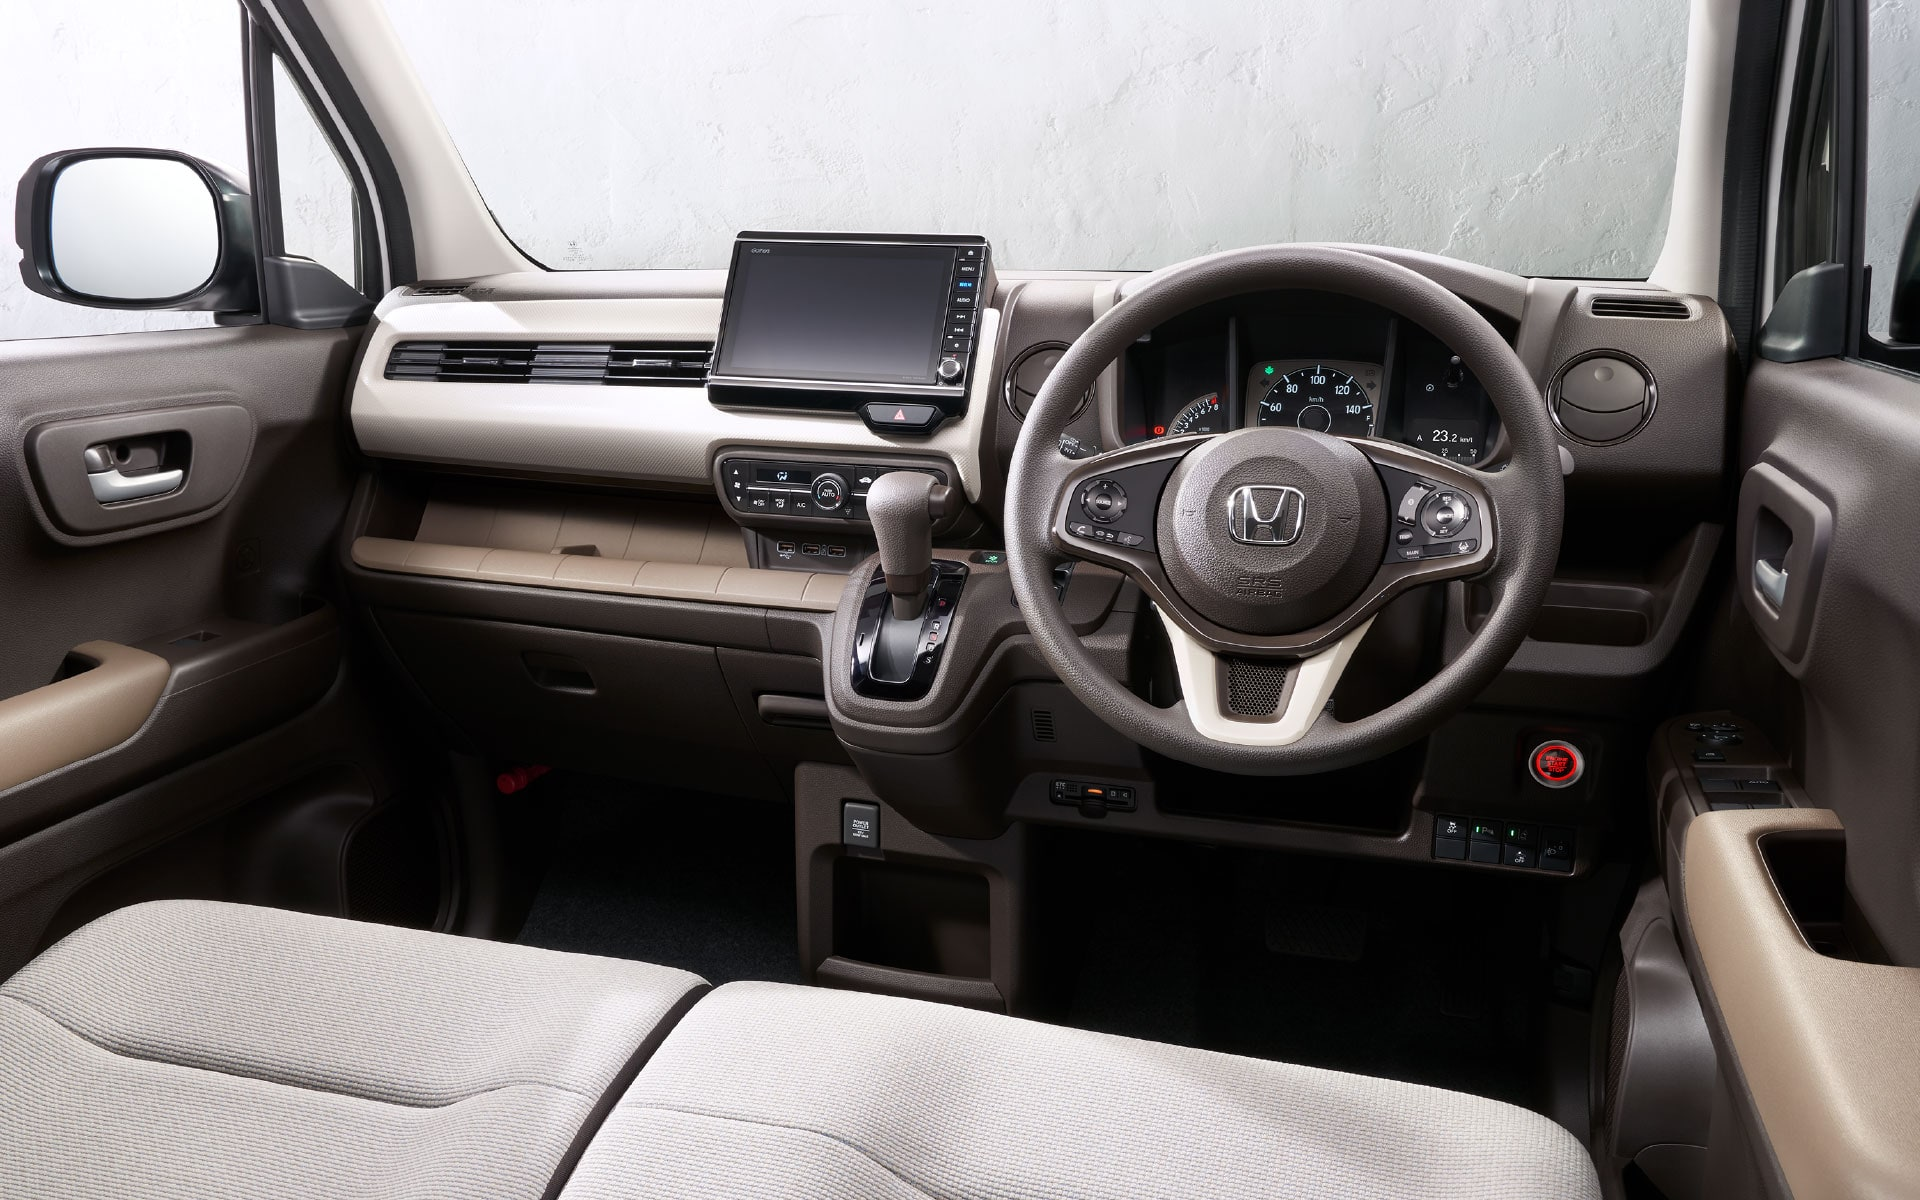 pic_interior_nwgn.jpg